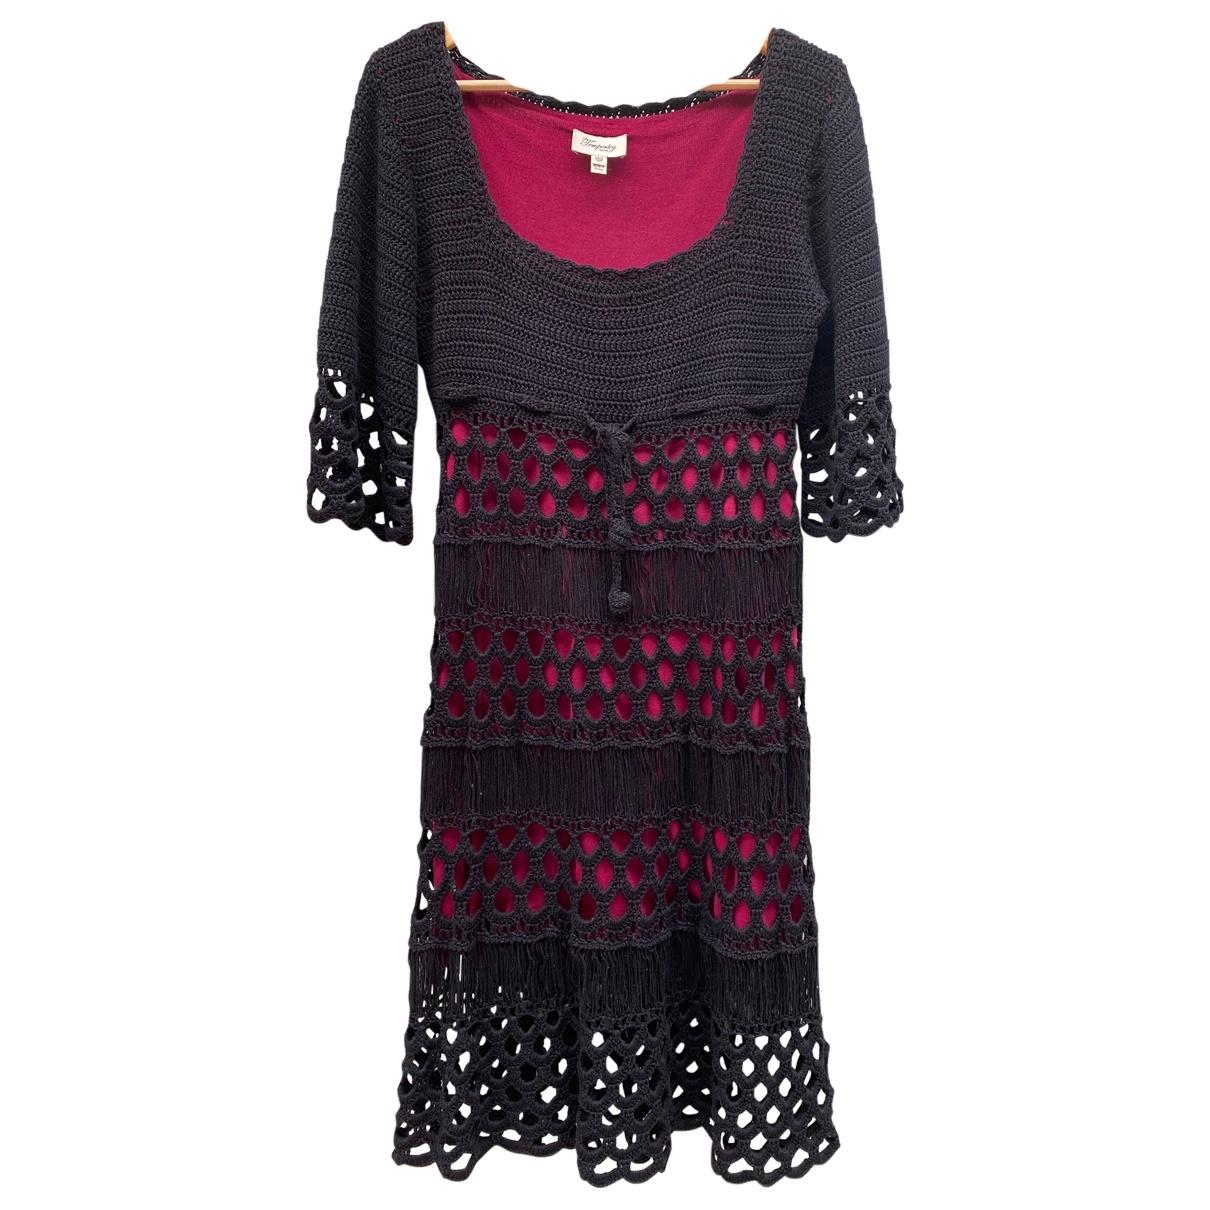 Temperley London \N Black Cotton dress for Women 12 UK